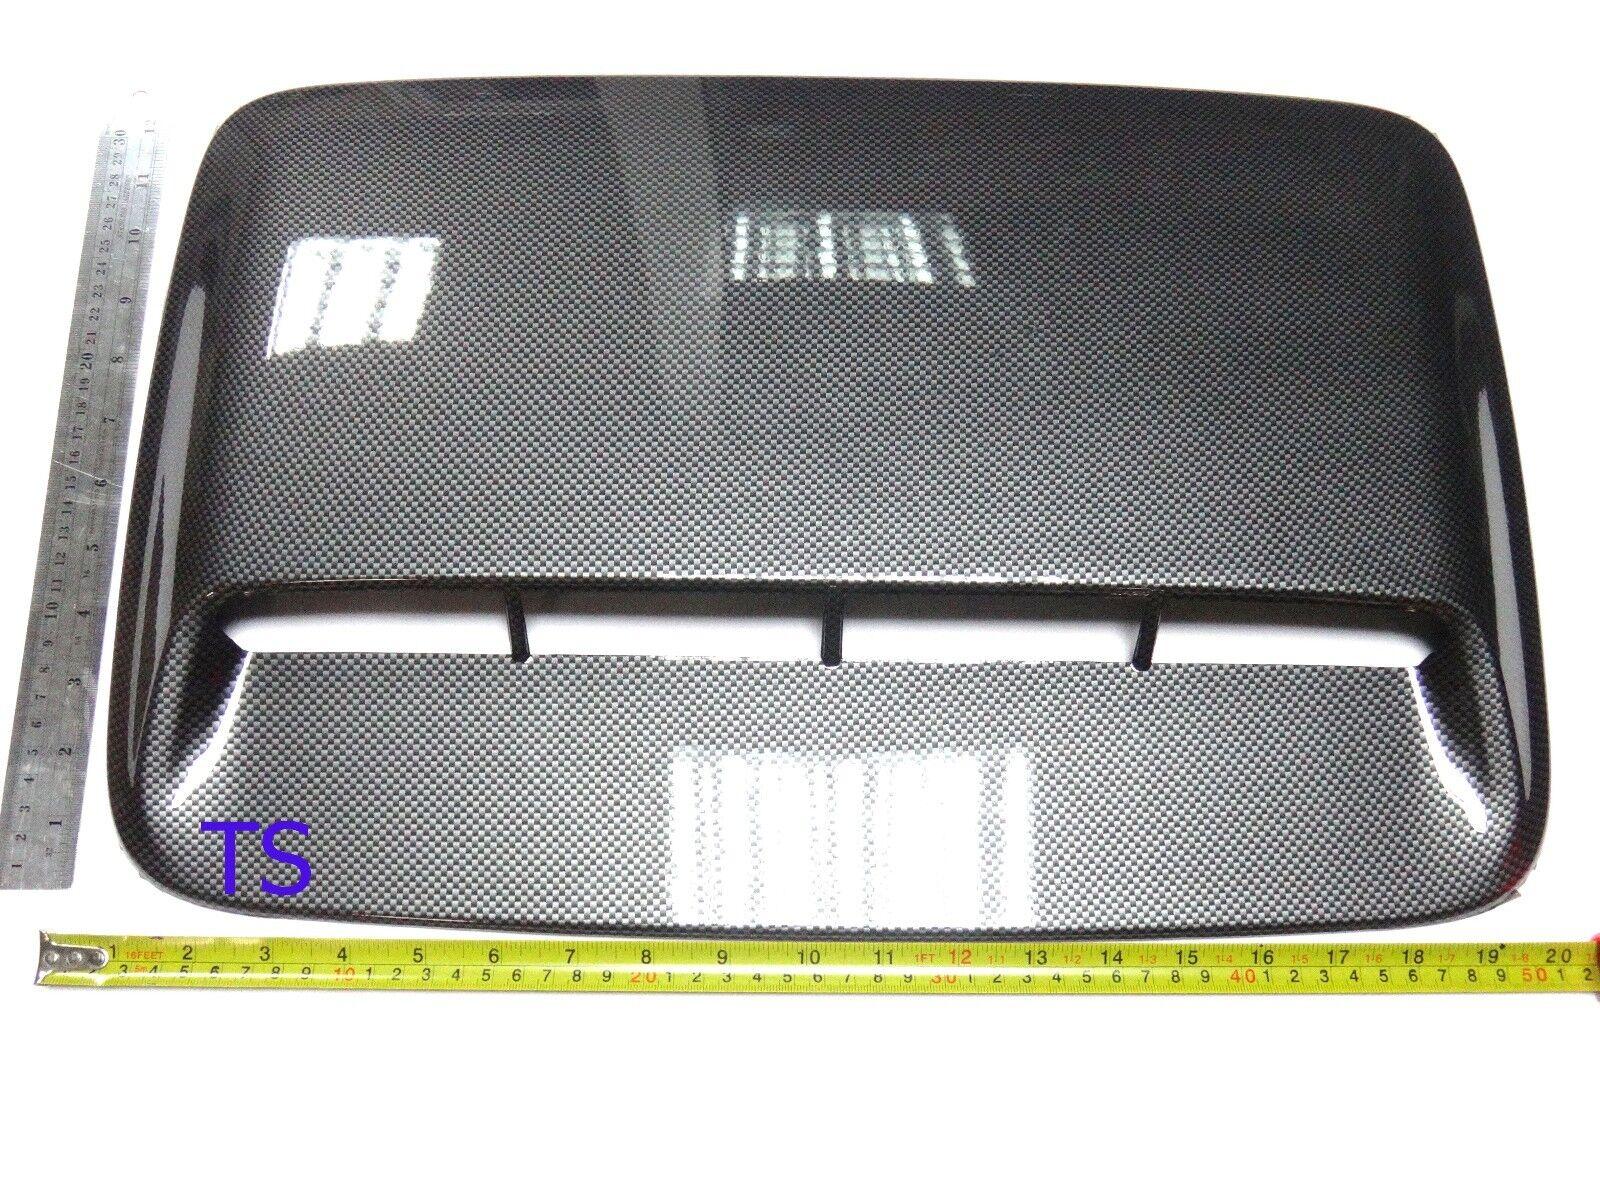 BLACK Carbon SCOOP TURBO FAKE COVER FOR TOYOTA HILUX VIGO CHAMP SR5 2011-2015